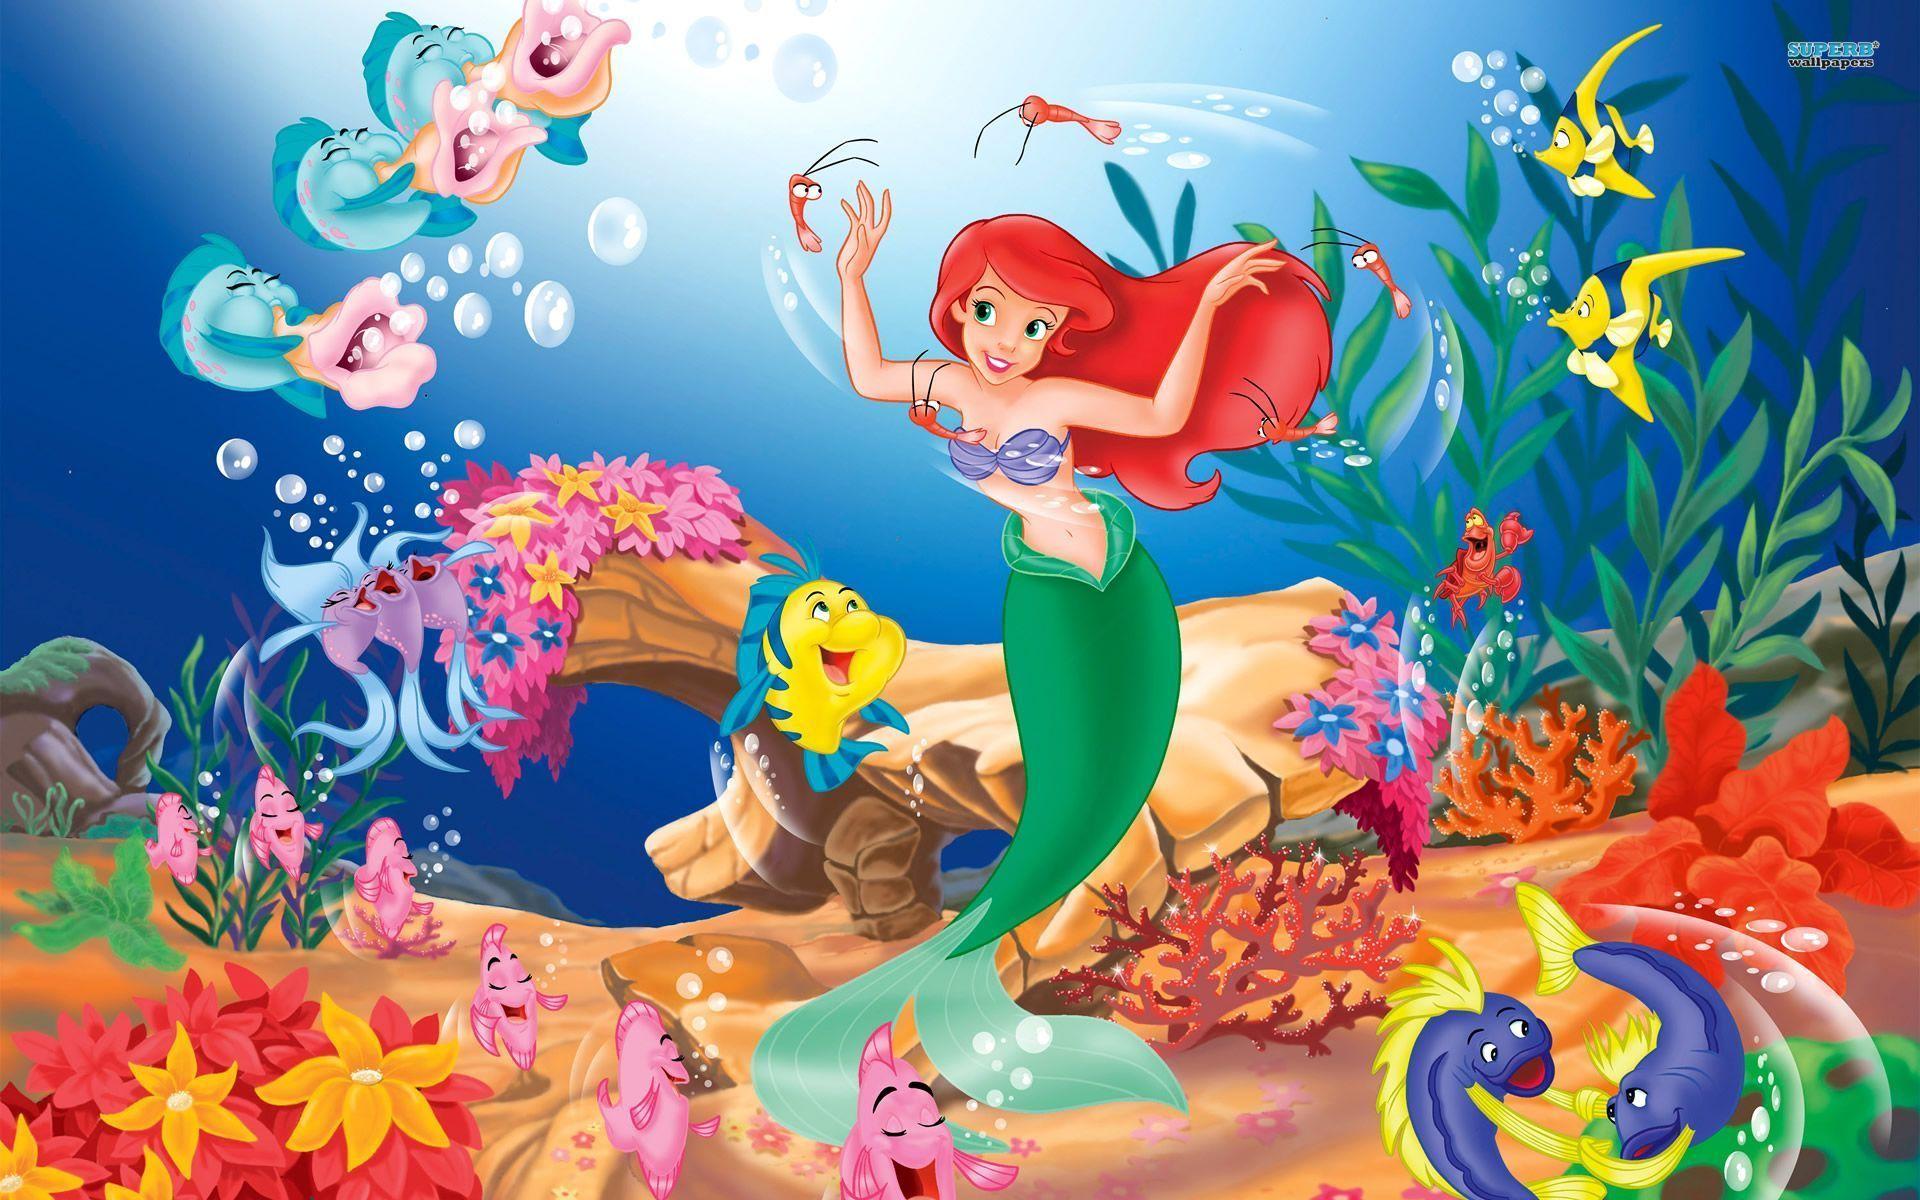 Little Mermaid Wallpaper